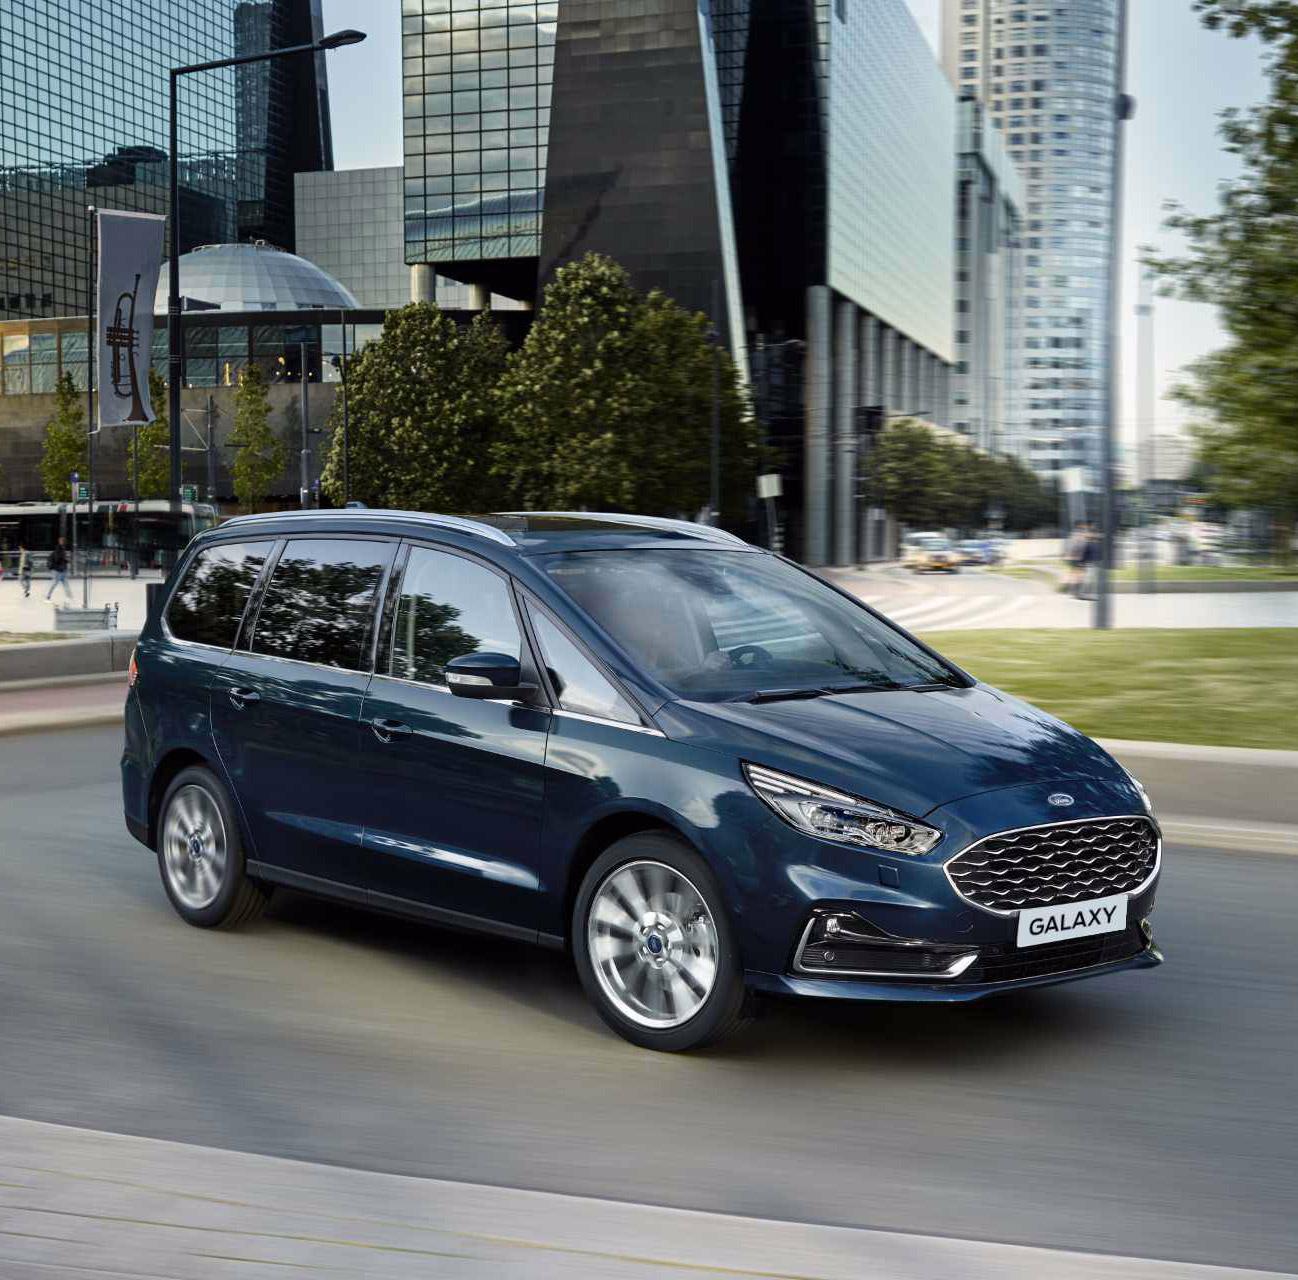 Ford Galaxy på vej rundt i et sving